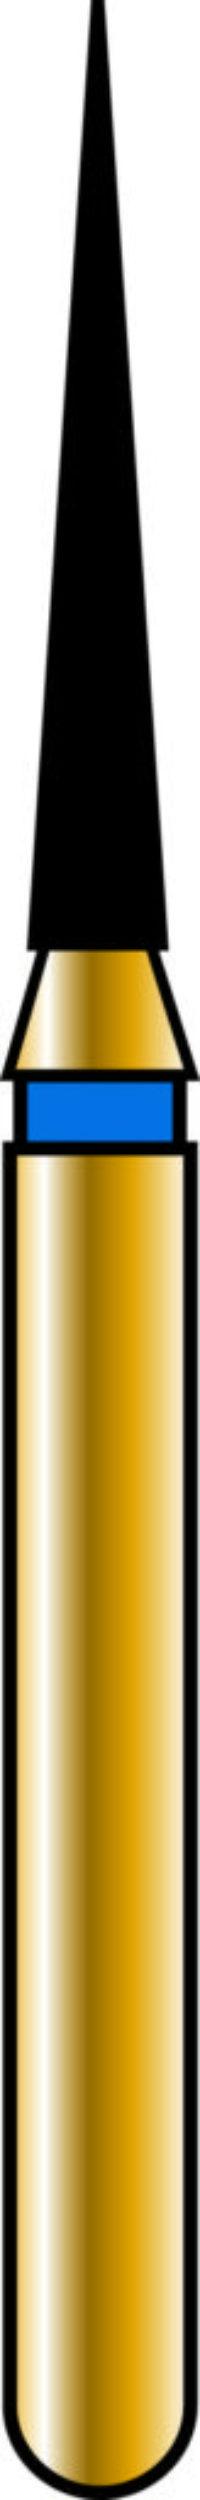 Flame 12-8mm Gold Diamond Bur